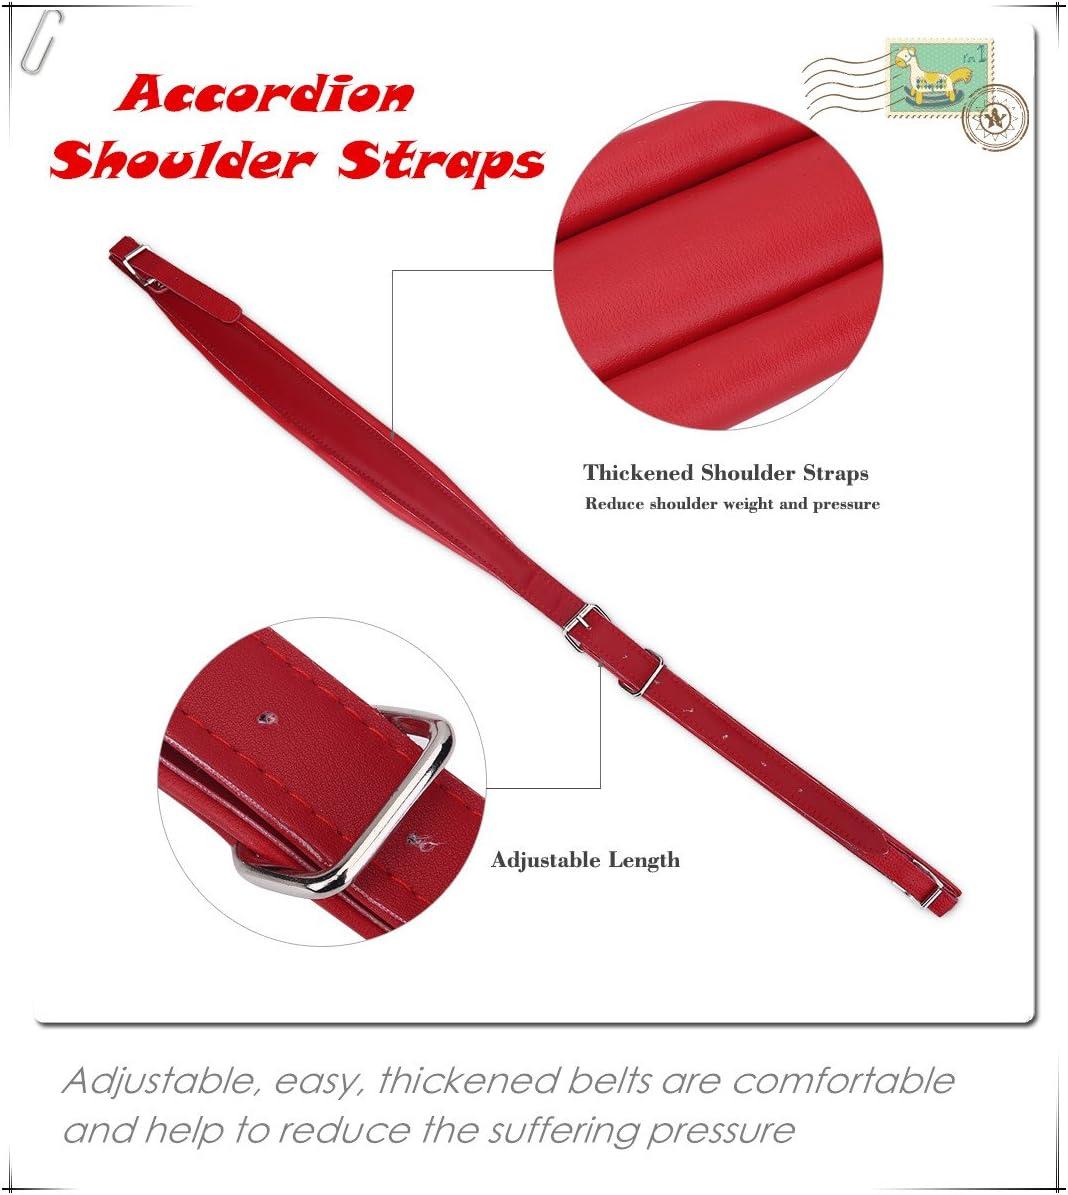 YouCY Adjustable Accordion Shoulder Straps Adjustable Soft Accordion Shoulder Straps Set Comfortable Accordion Belt,White